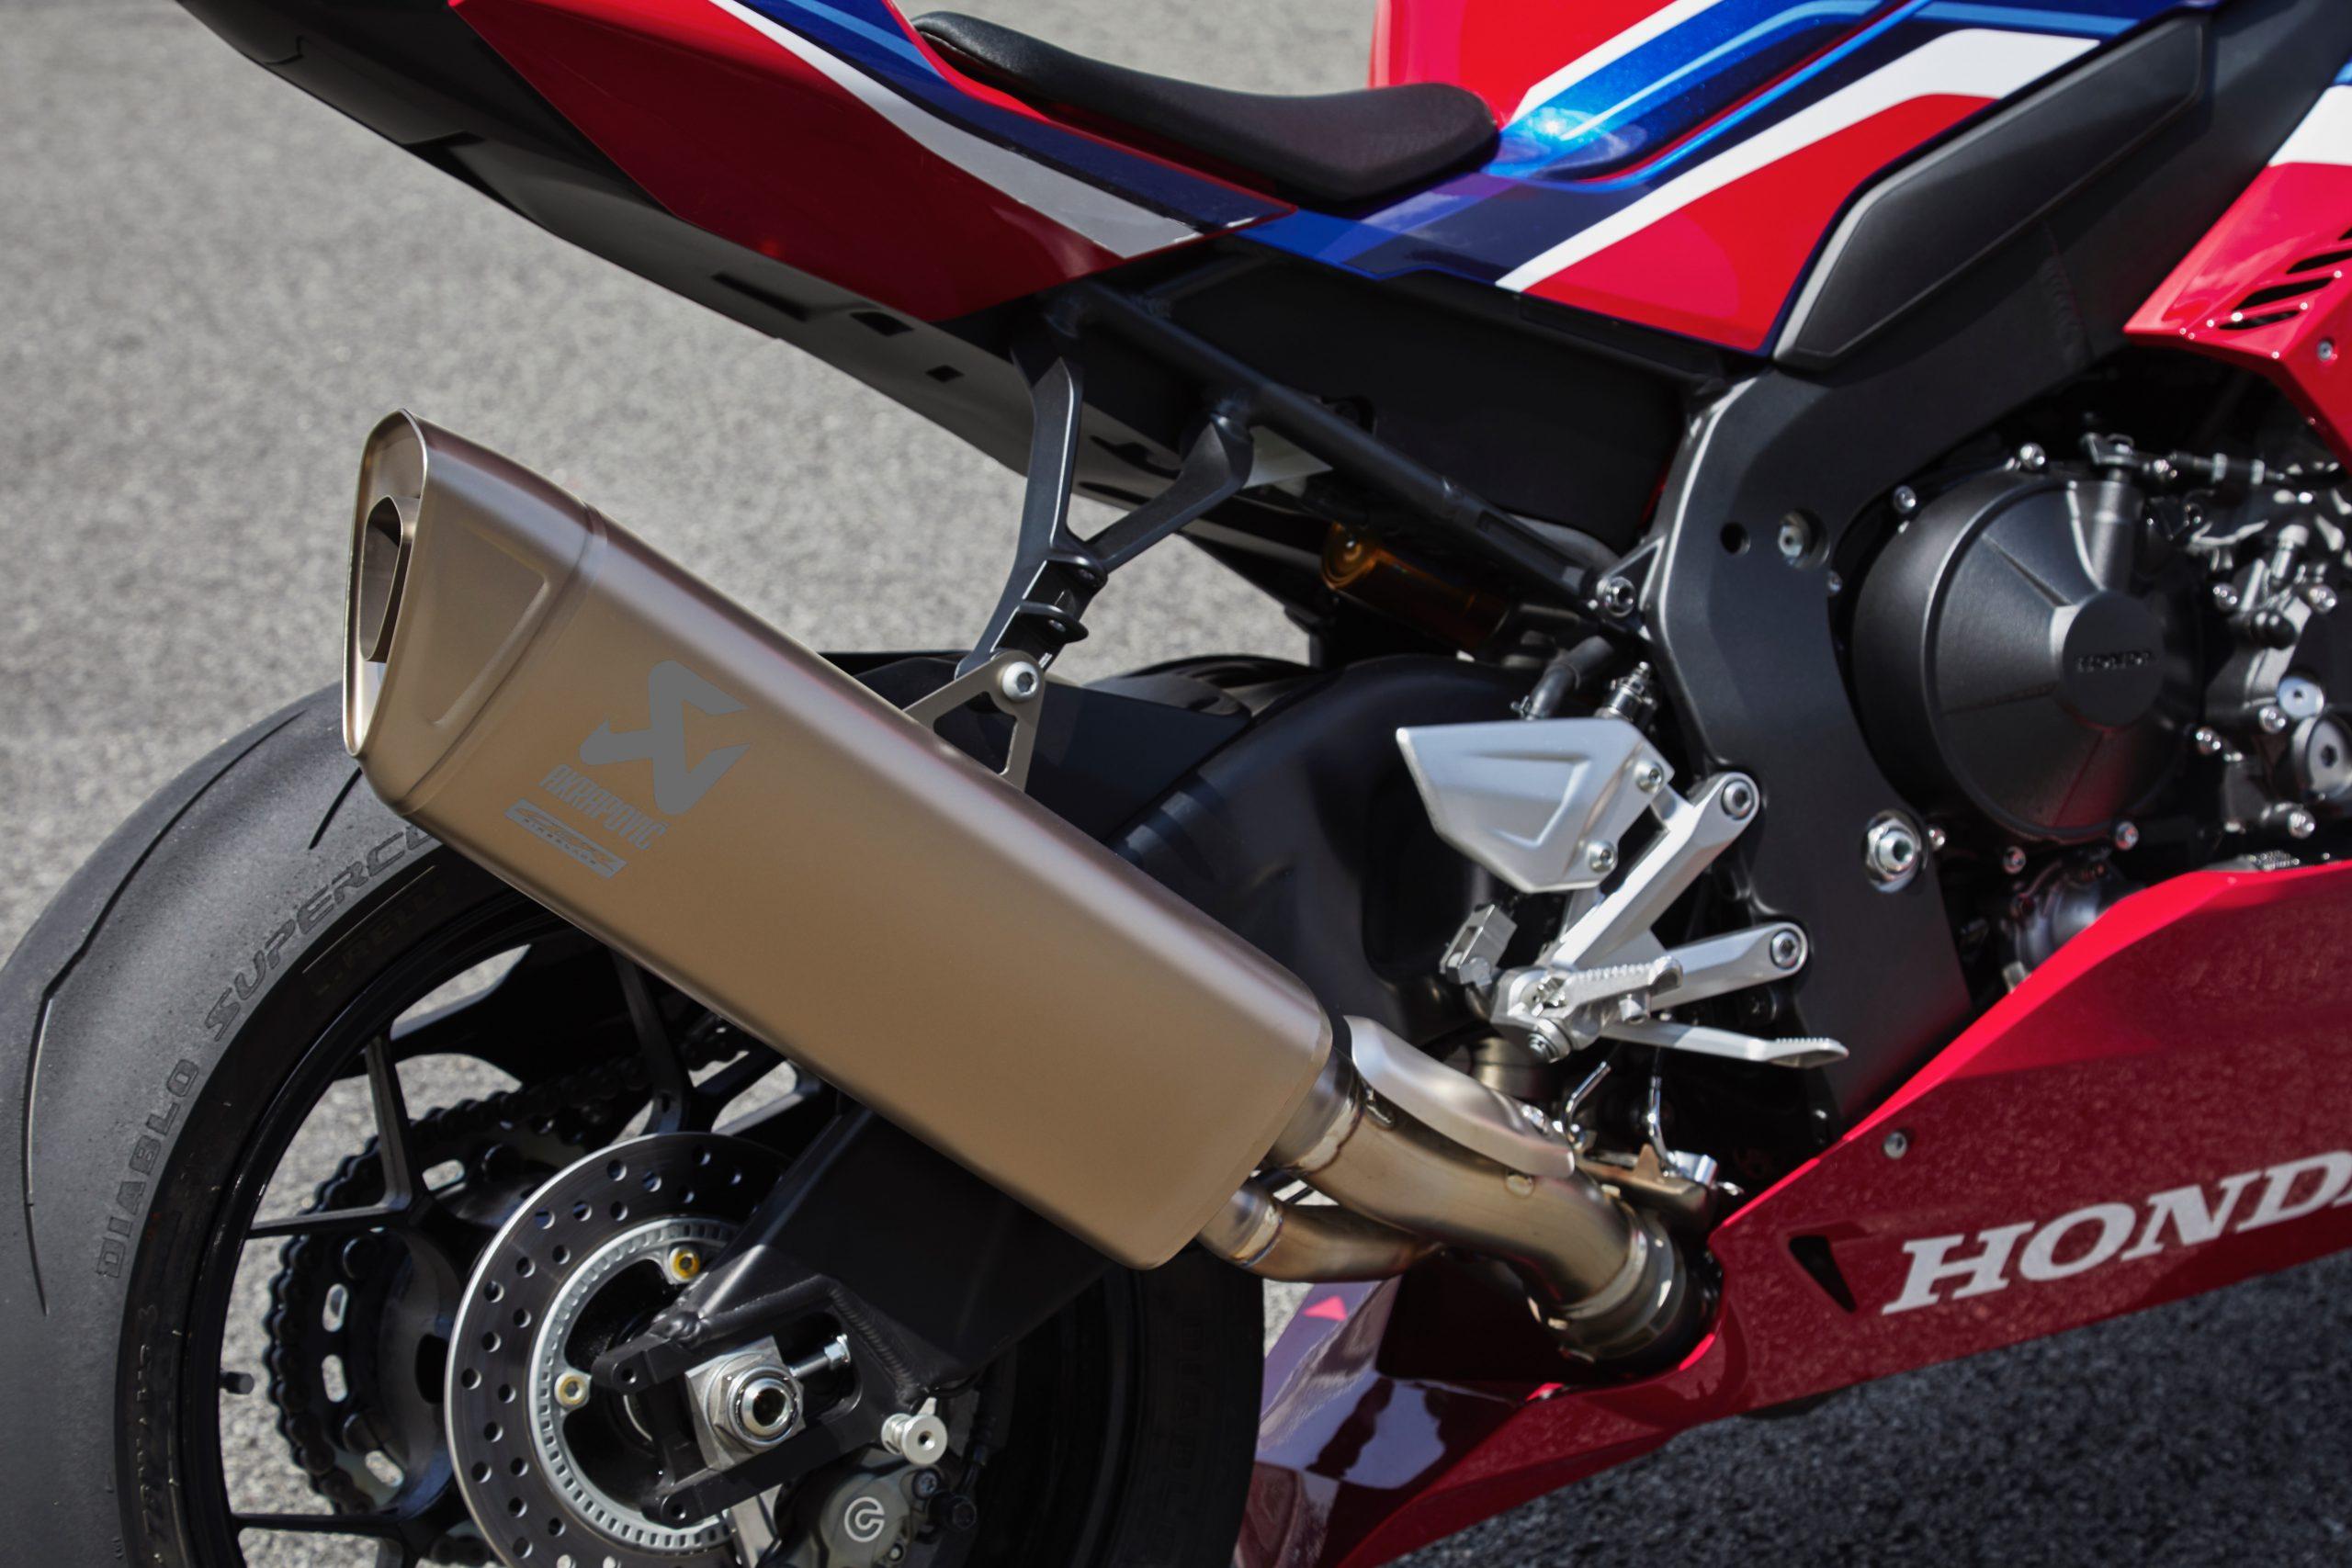 21 Honda CBR1000RR-R Fireblade SP exhaust